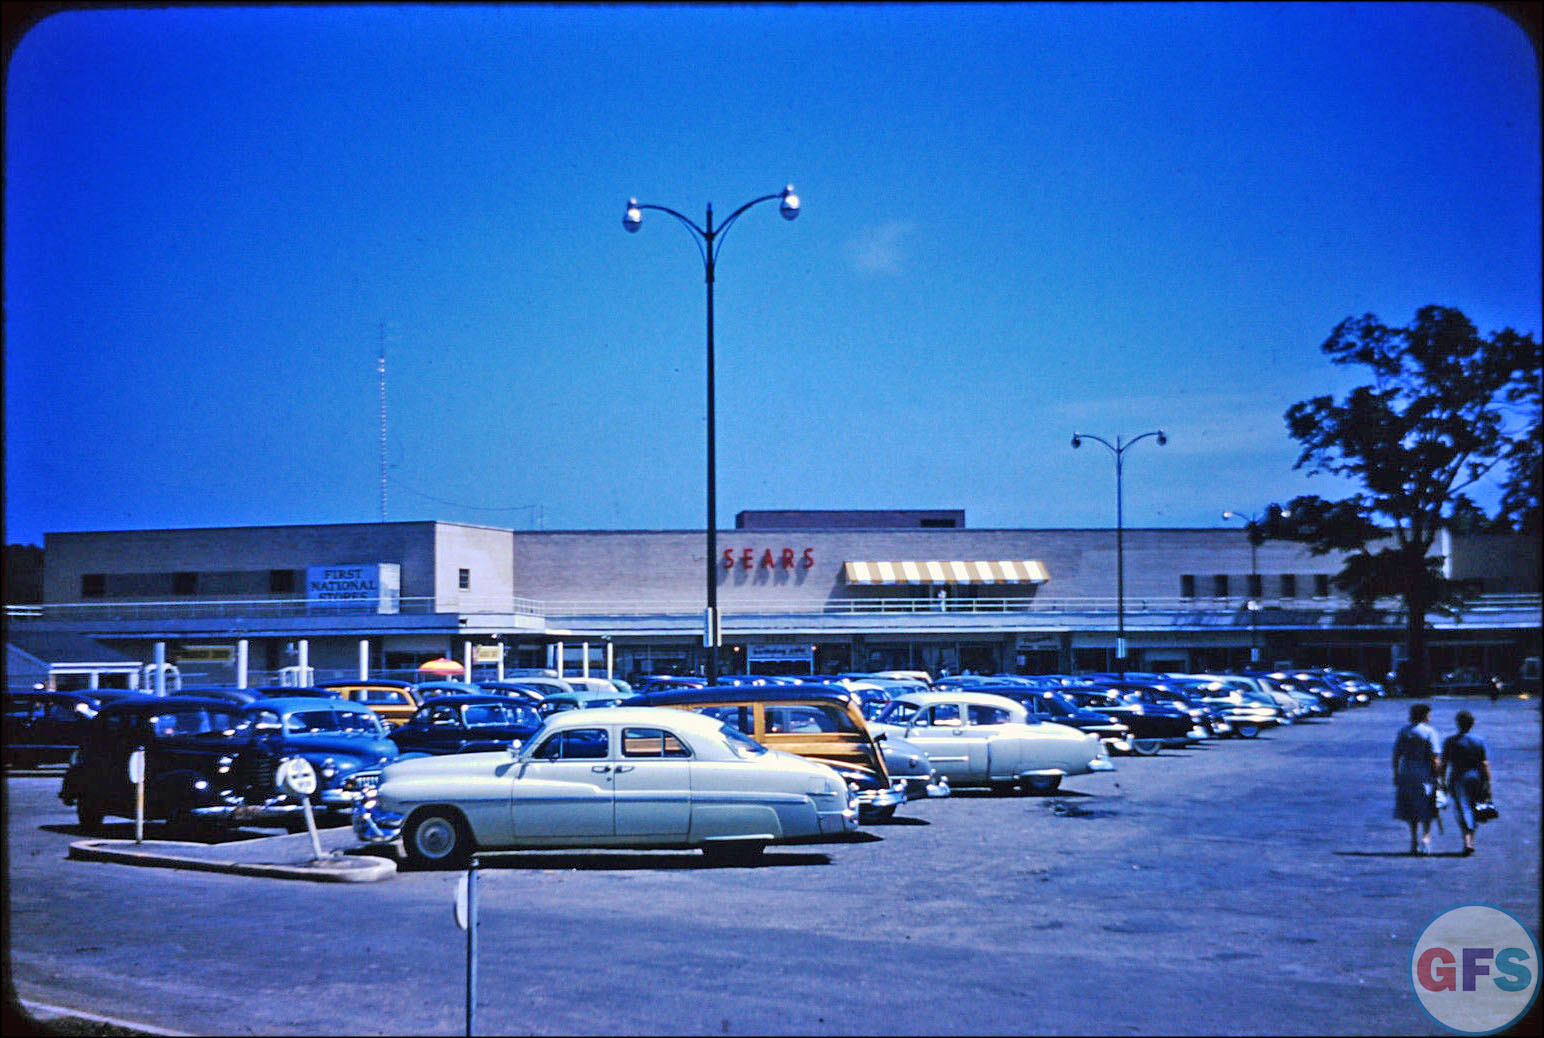 Kodachrome Memories 3 Sears Parking Lot 1940s